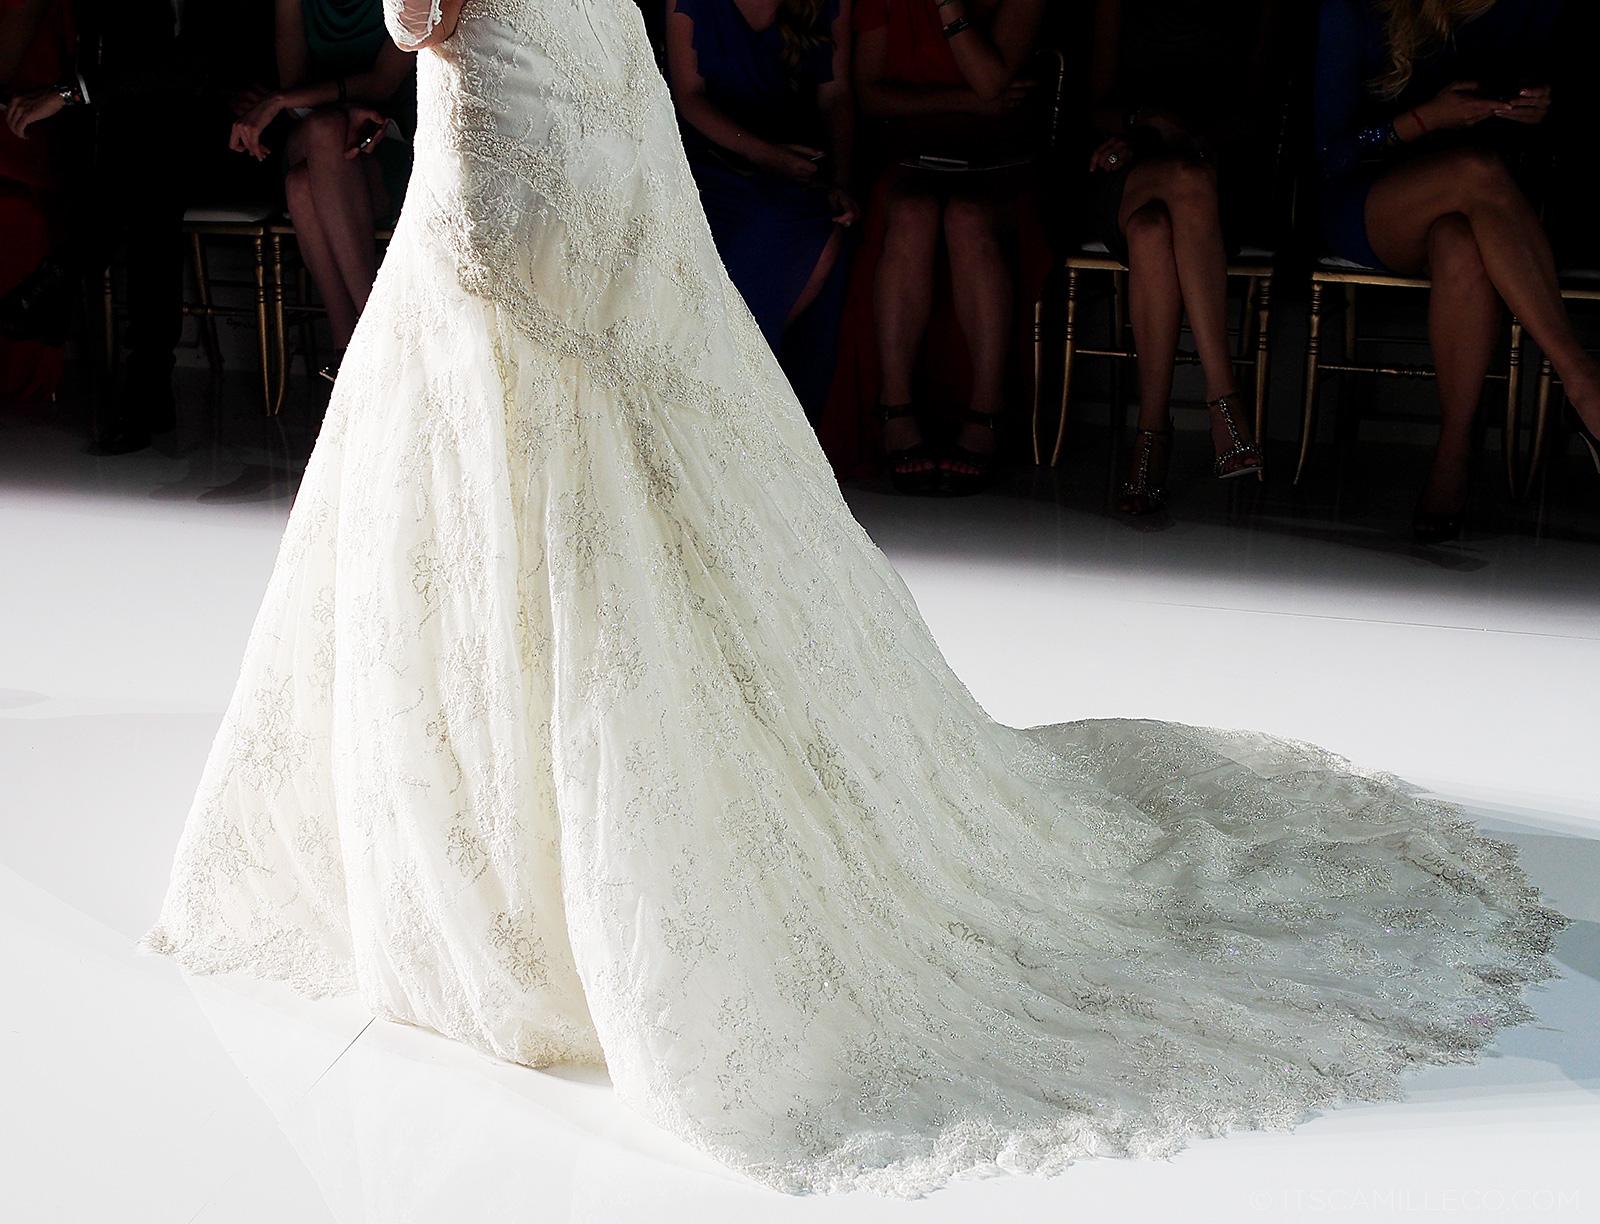 Simplest Wedding Dress 97 Best  itscamilleco itscamilleco